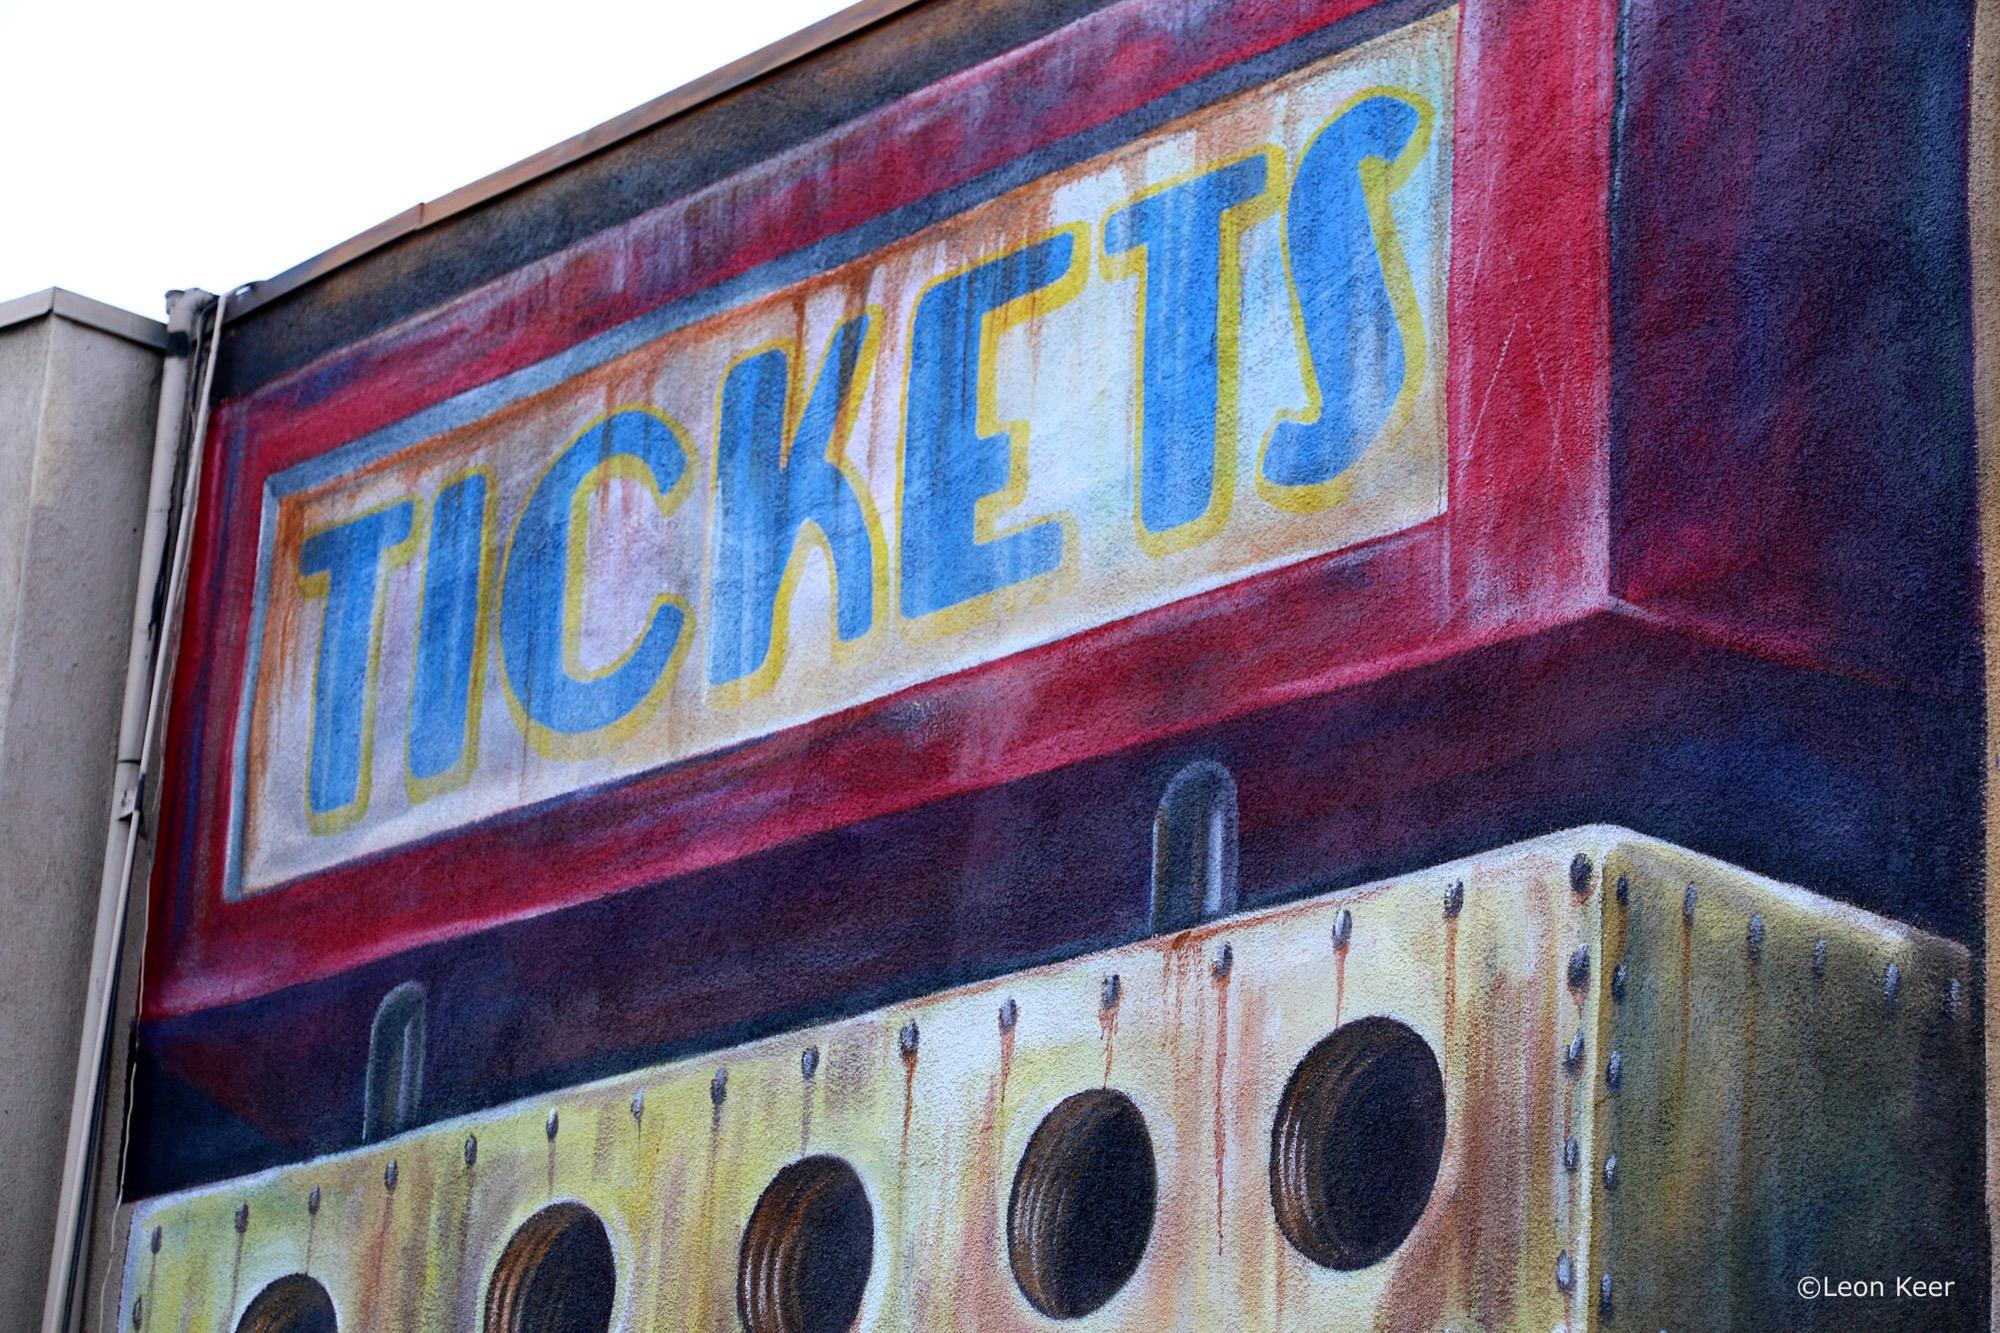 Leon Keer in Long Beach, California Artes & contextos tickets mural long beach powwow 28422640347 o